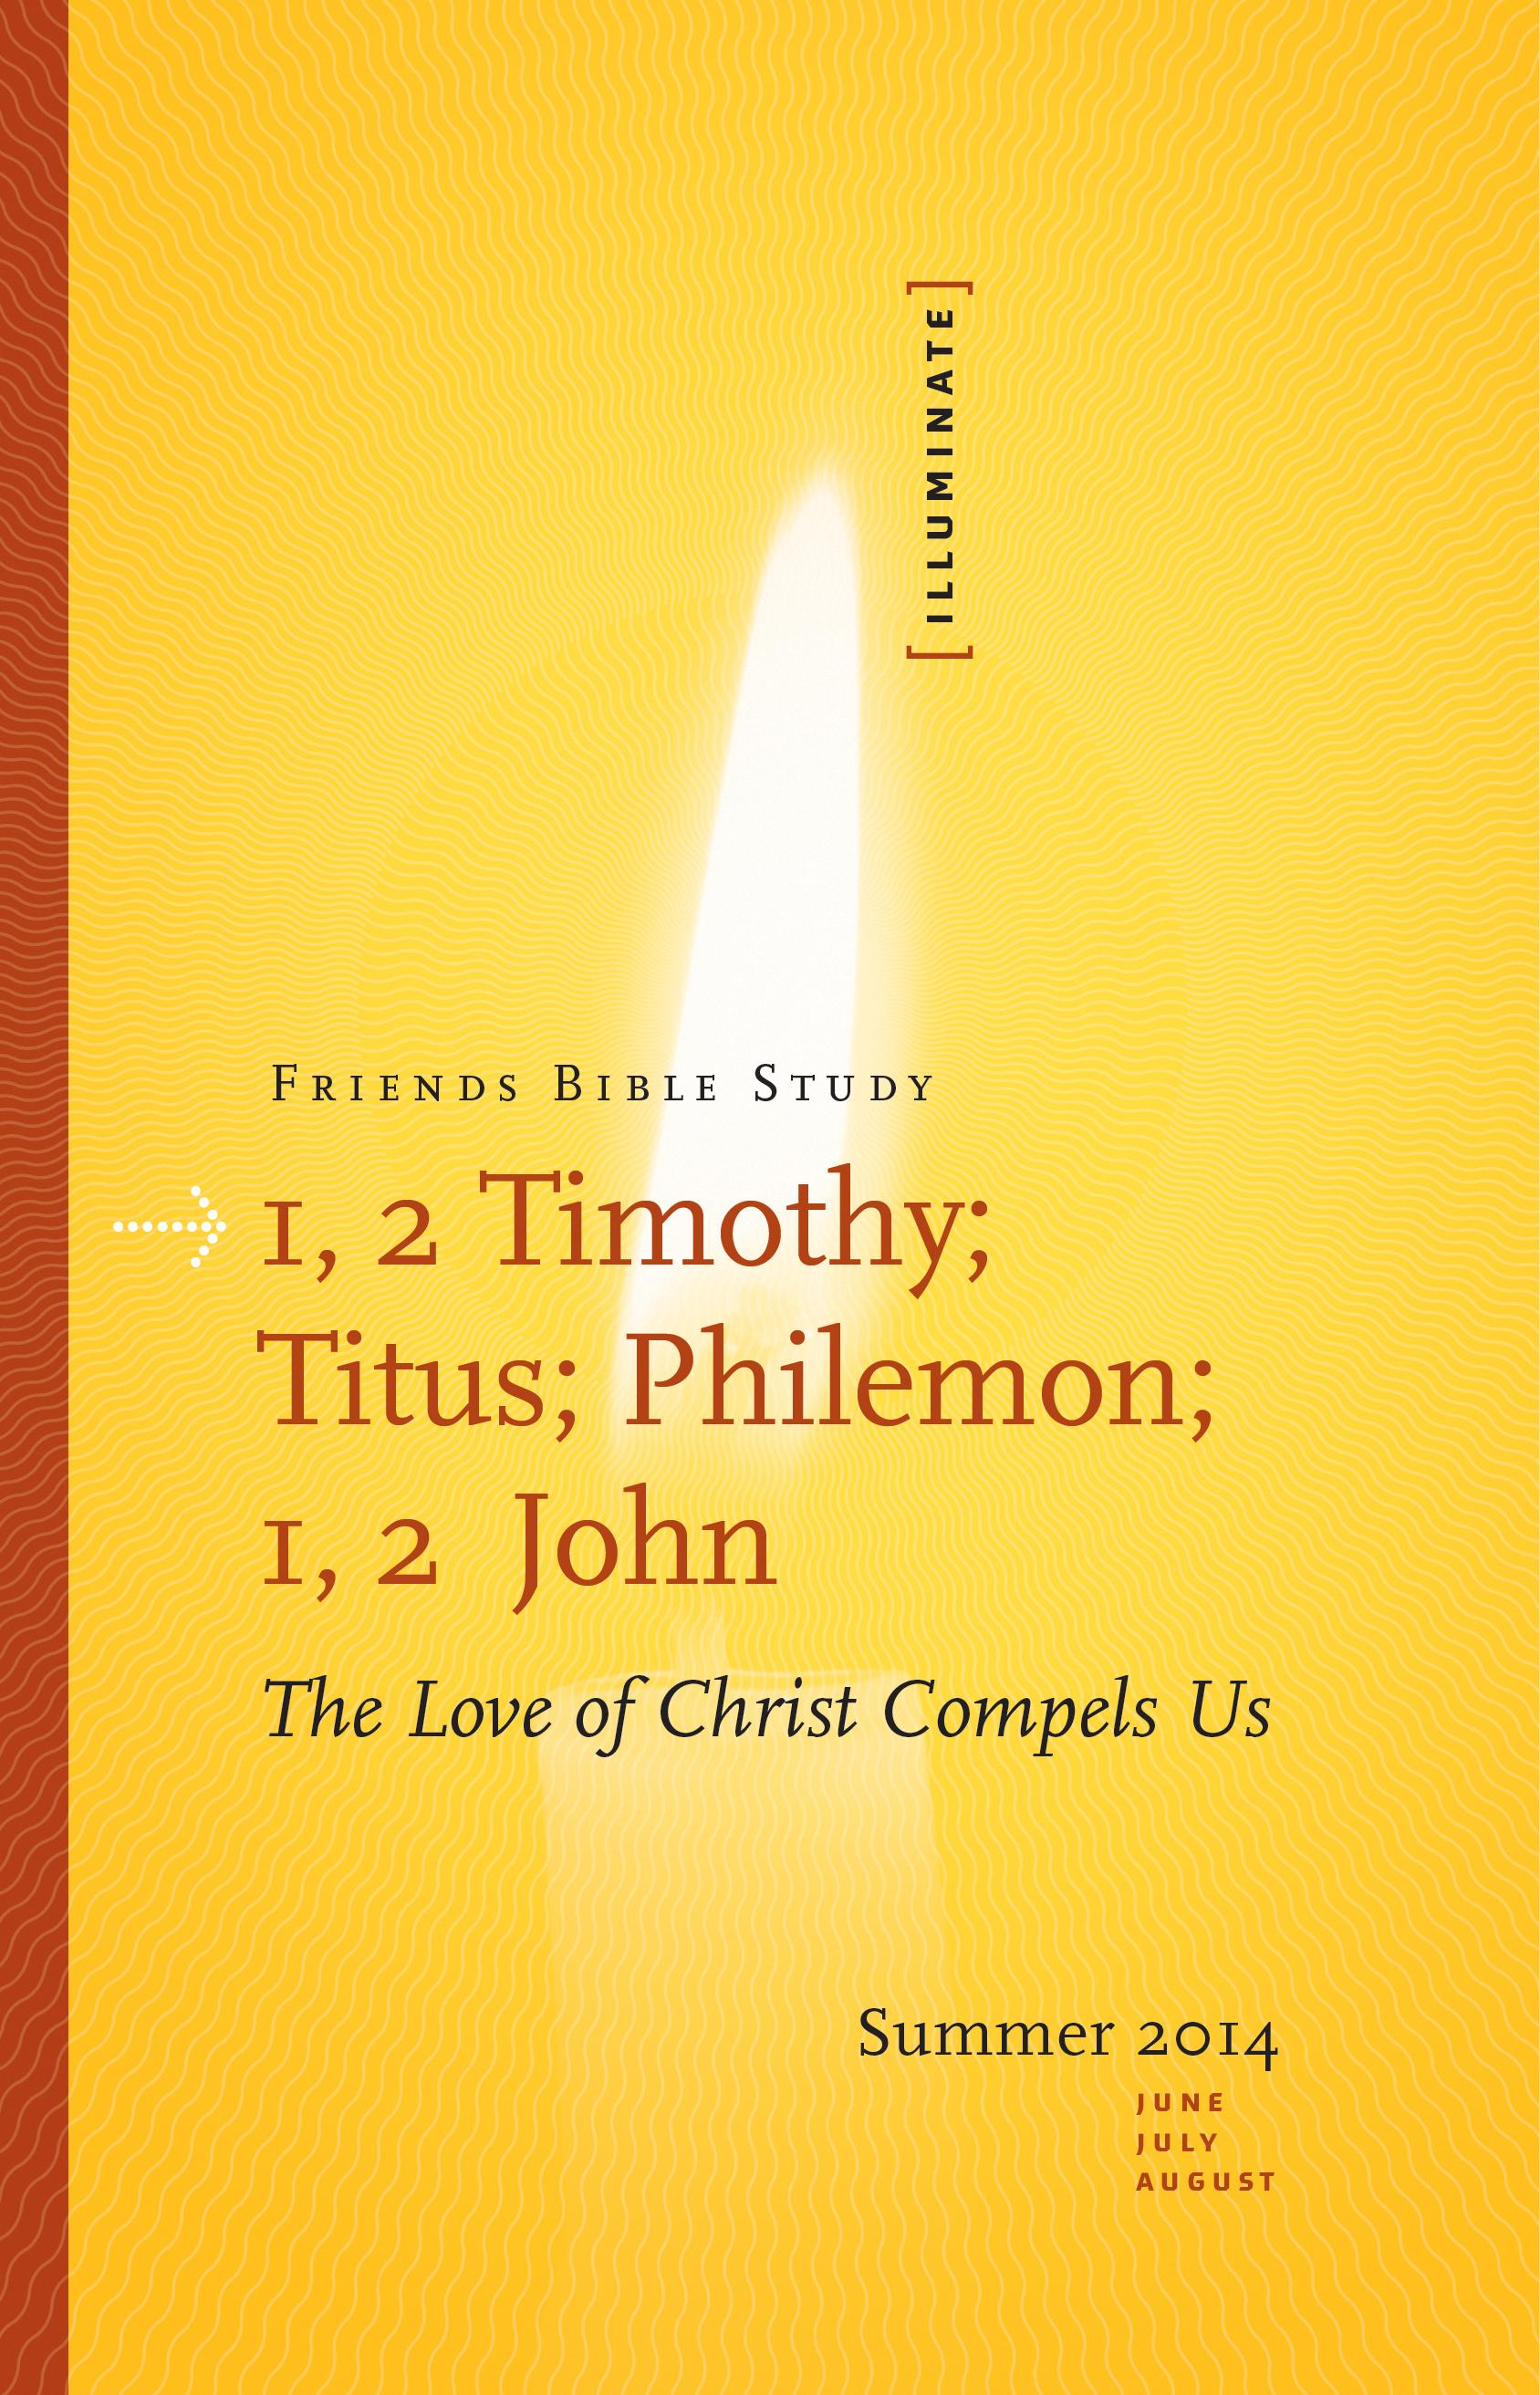 1, 2 Timothy; Titus; Philemon; 1, 2 John